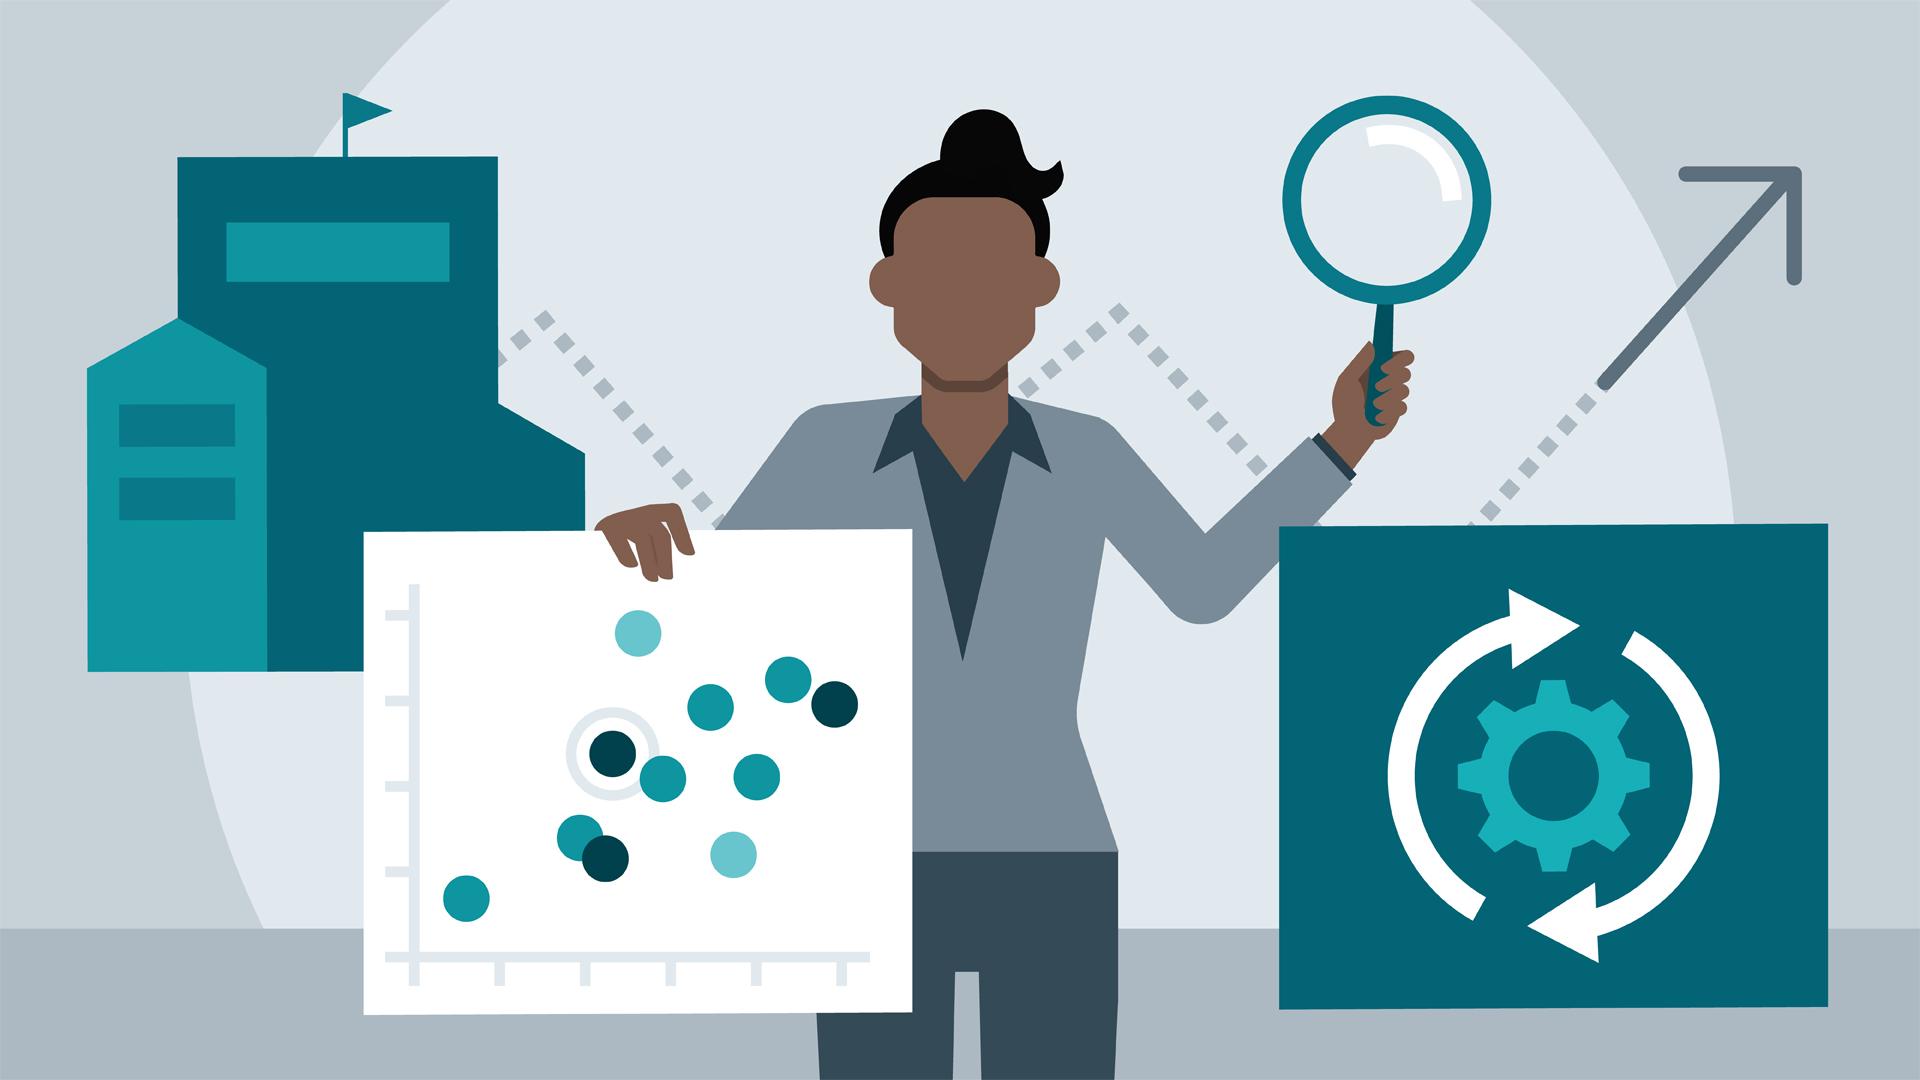 Lean Six Sigma Analyze Improve And Control Tools